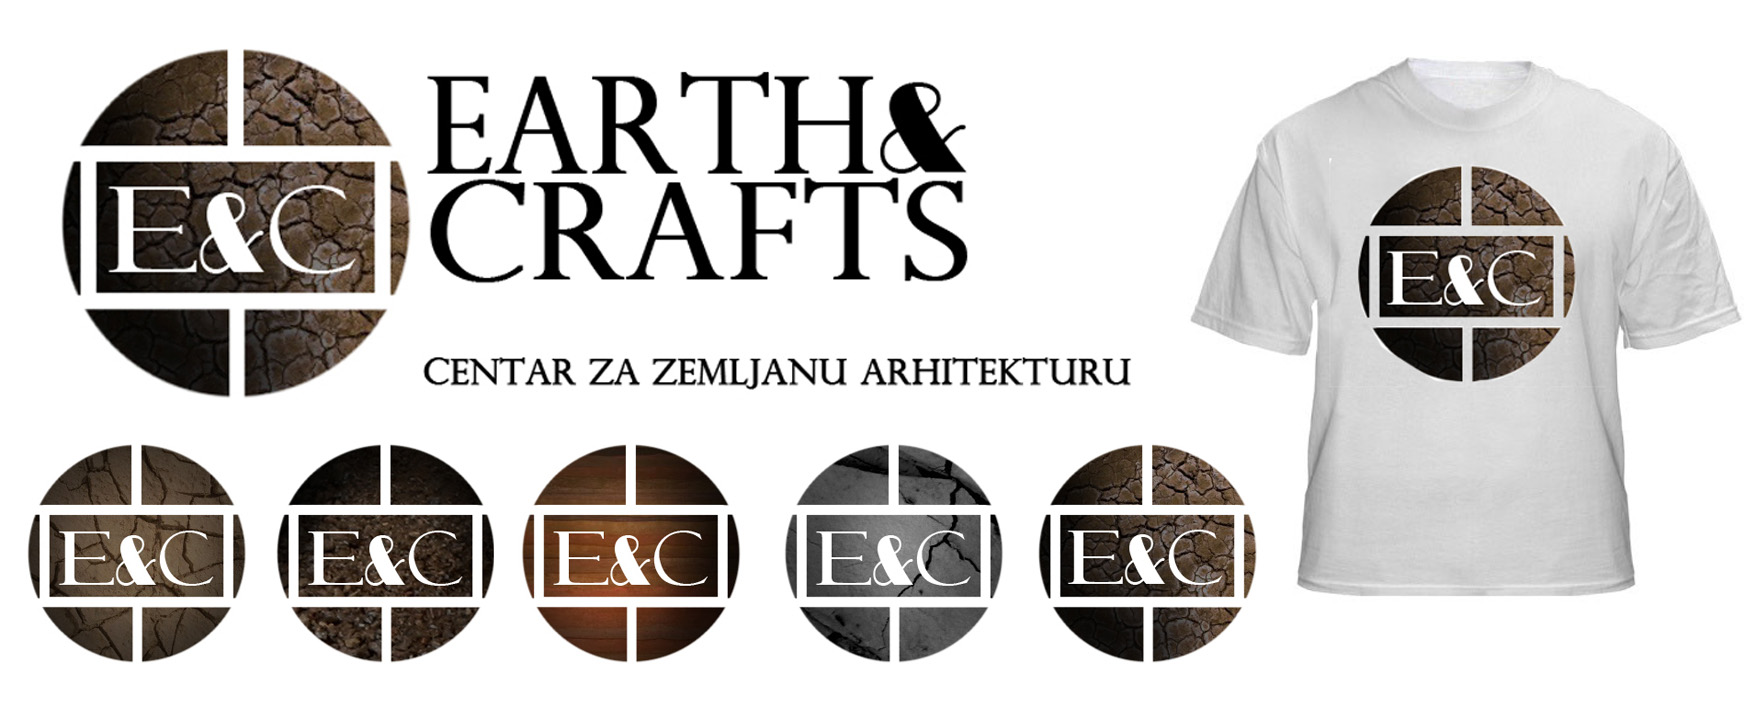 40 predlog logo EARTH&CRAFTS aleksandar stanojkovic aleksandar.stanojkovic@gmail.com